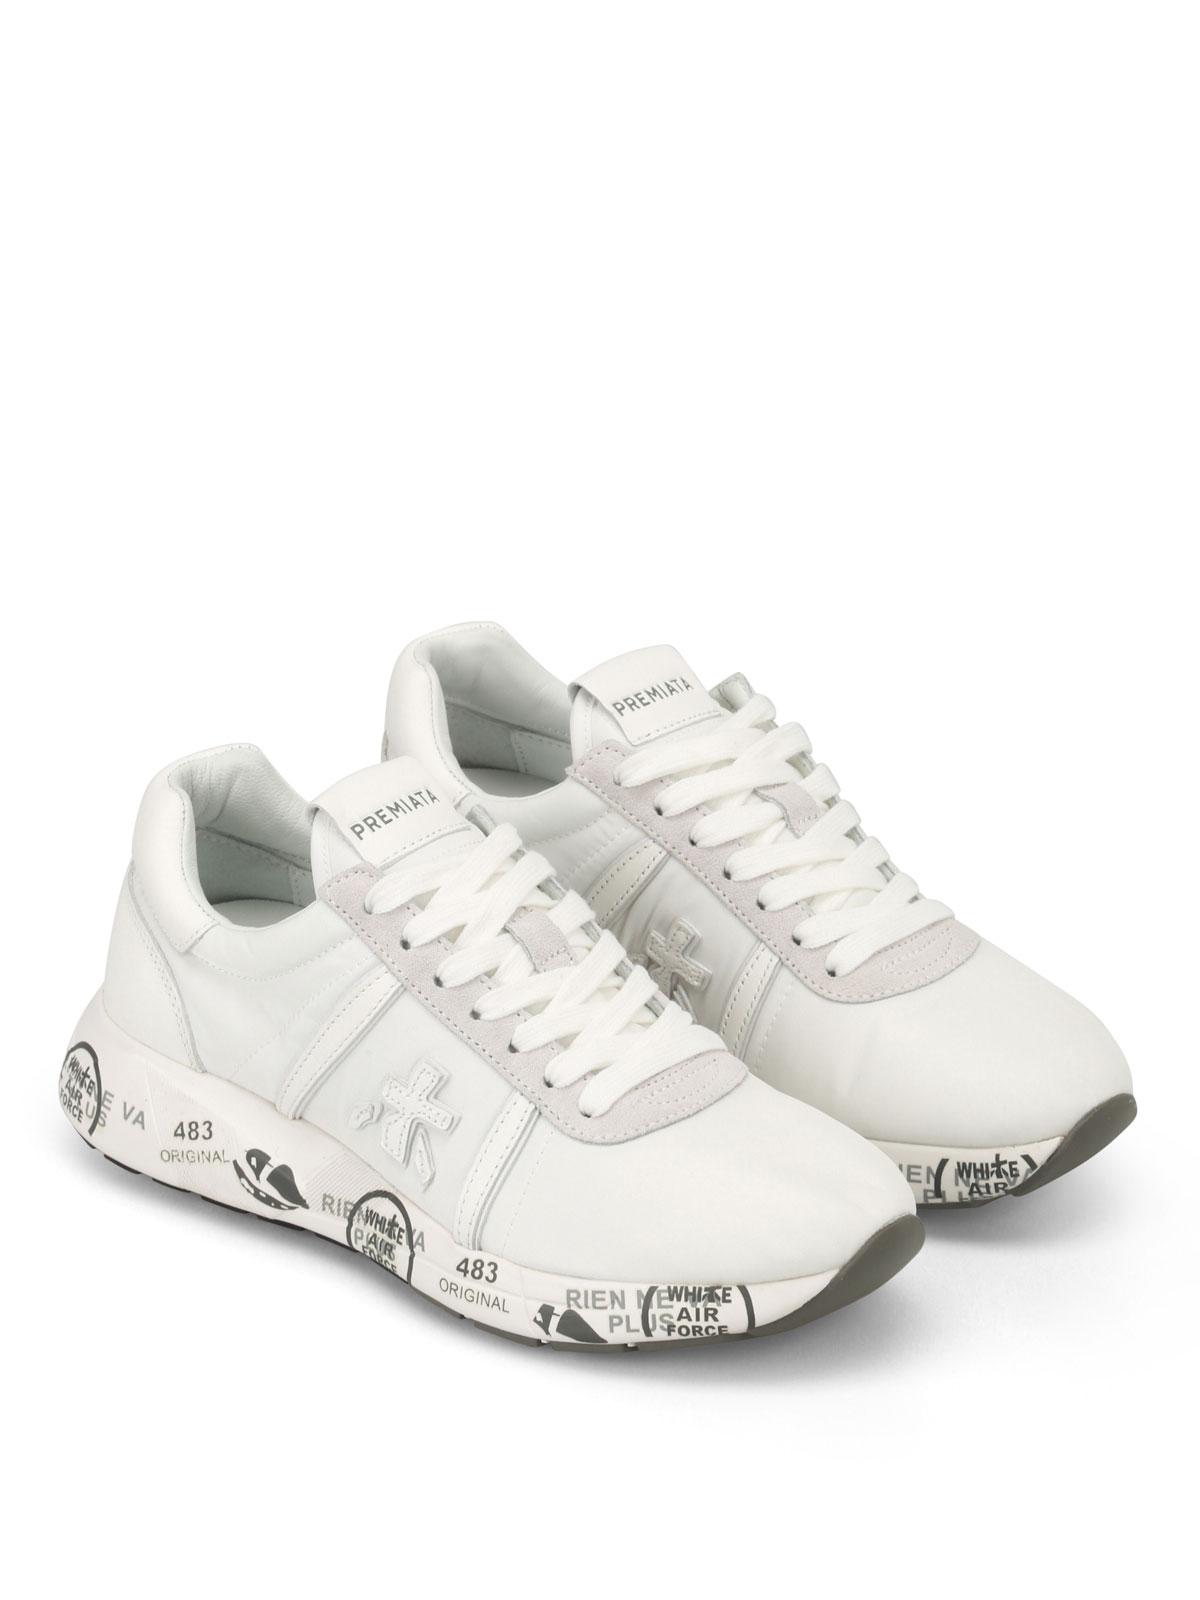 613392a6e1 Premiata - Sneaker Mattew bianche - sneakers - MATTEWD3044   iKRIX.com